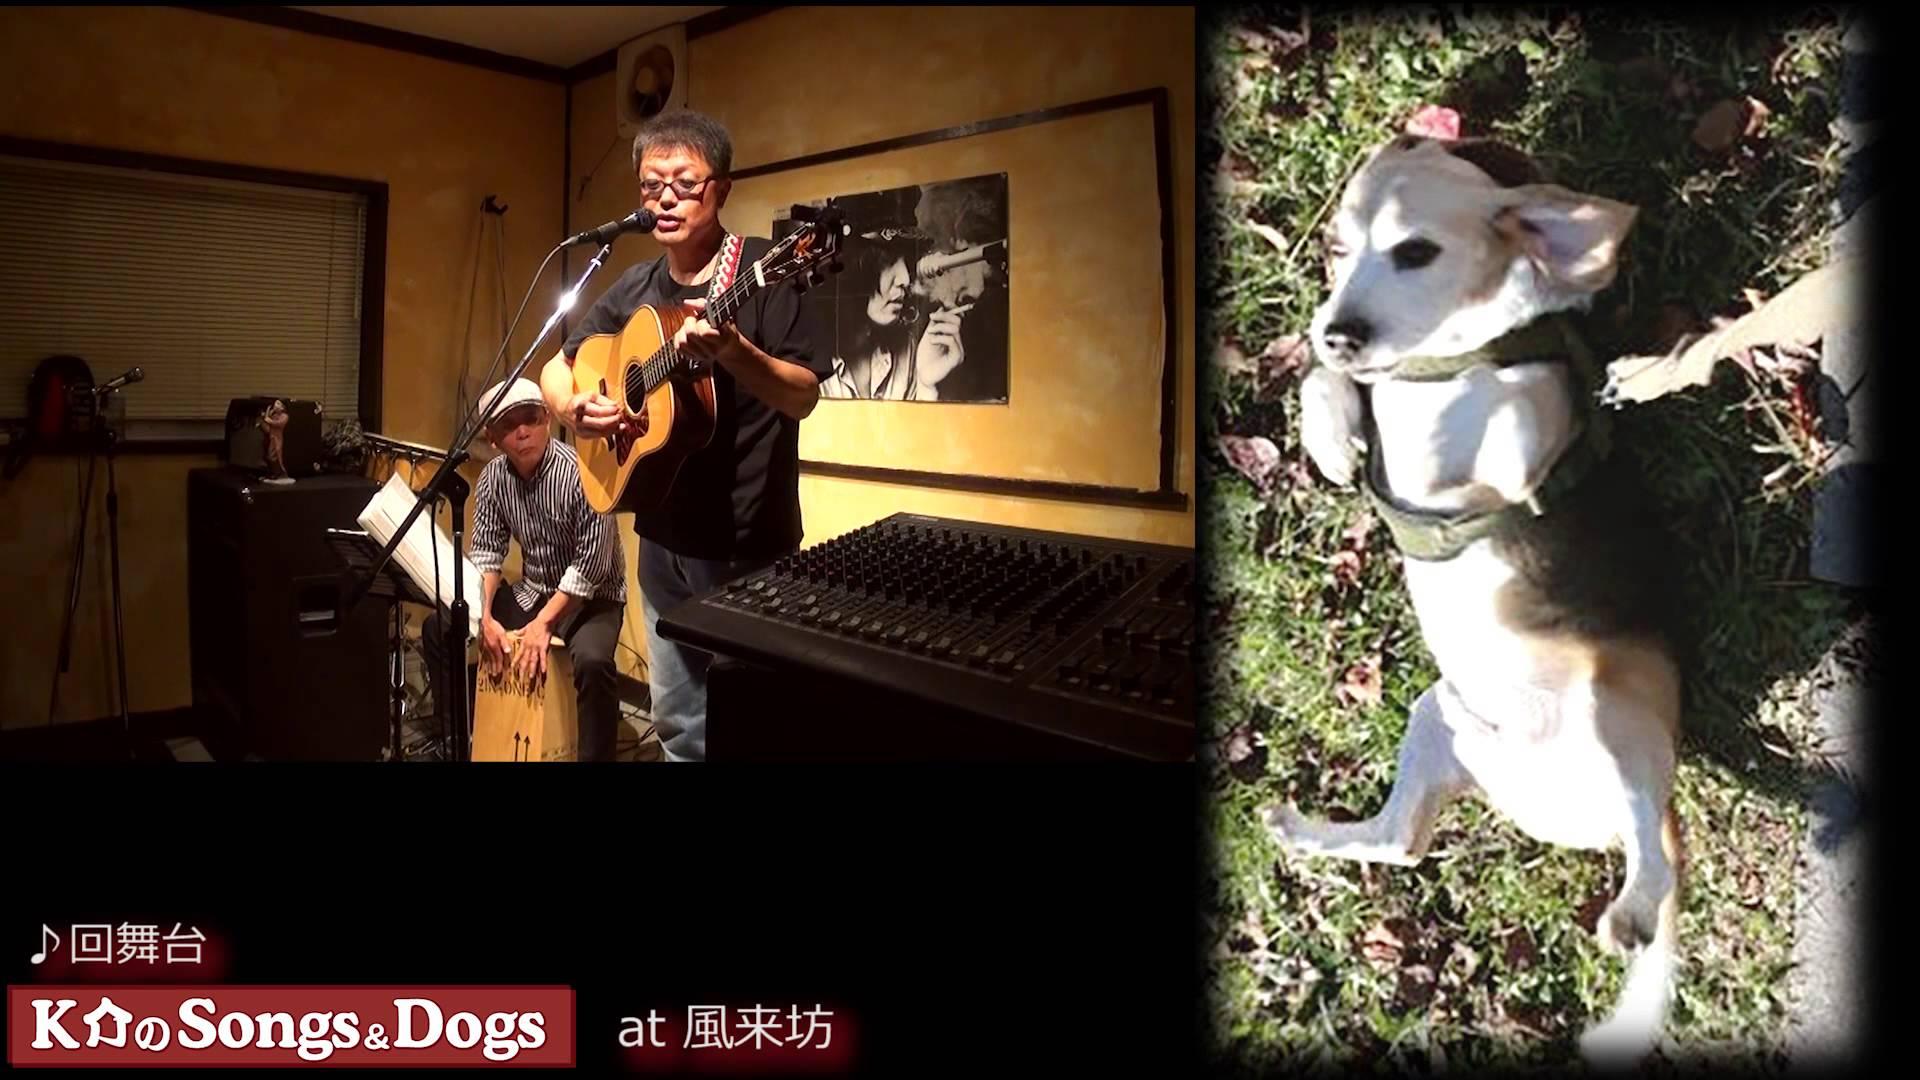 K介のSongs&Dogs週末はミュージシャン90